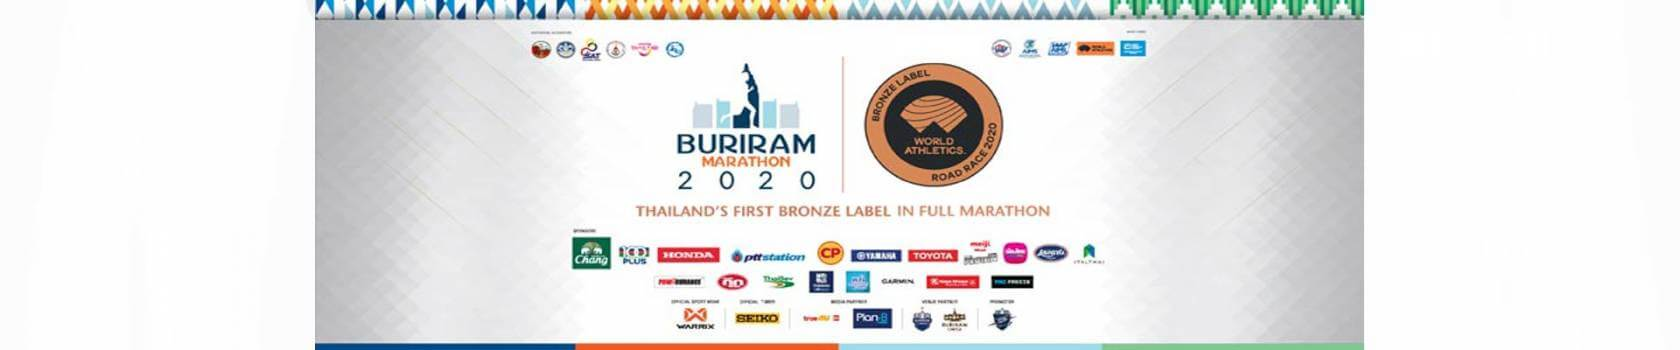 Buriram Marathon 2020